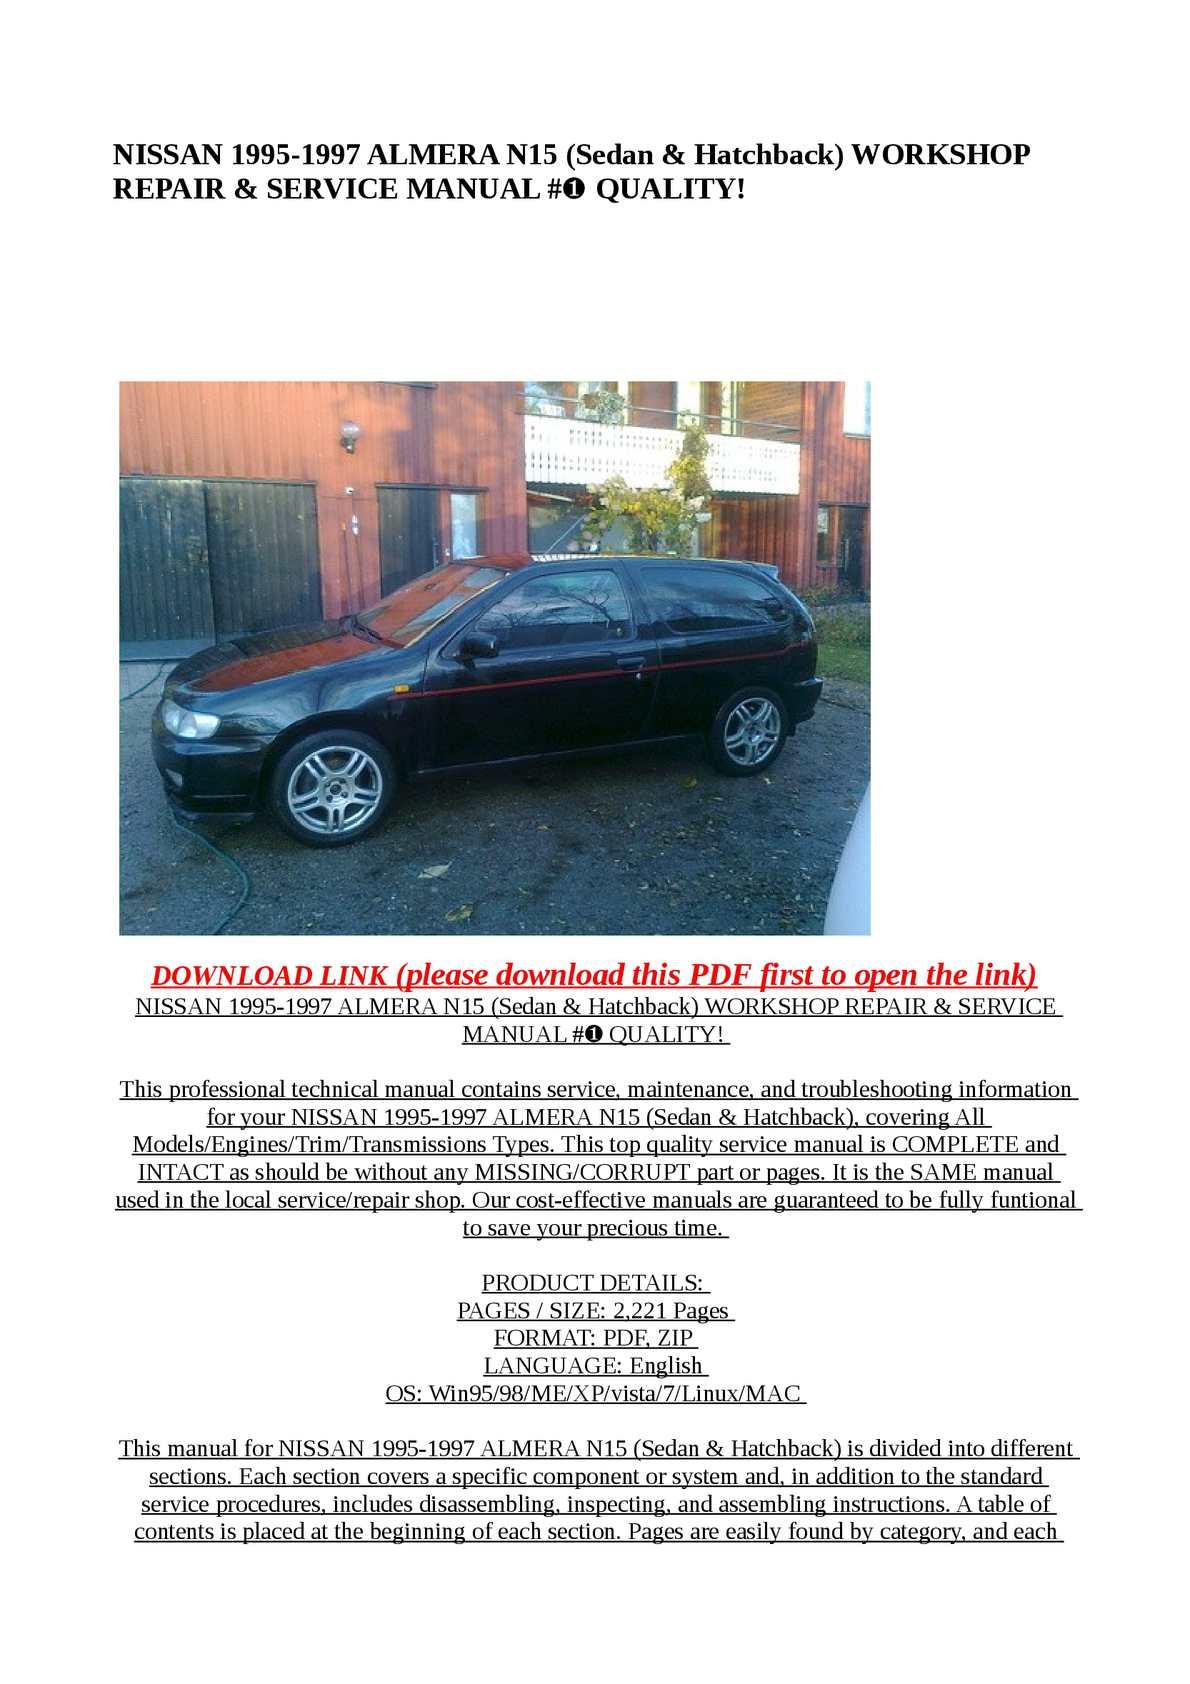 Calaméo - NISSAN 1995-1997 ALMERA N15 (Sedan & Hatchback) WORKSHOP REPAIR & SERVICE  MANUAL #➀ QUALITY!